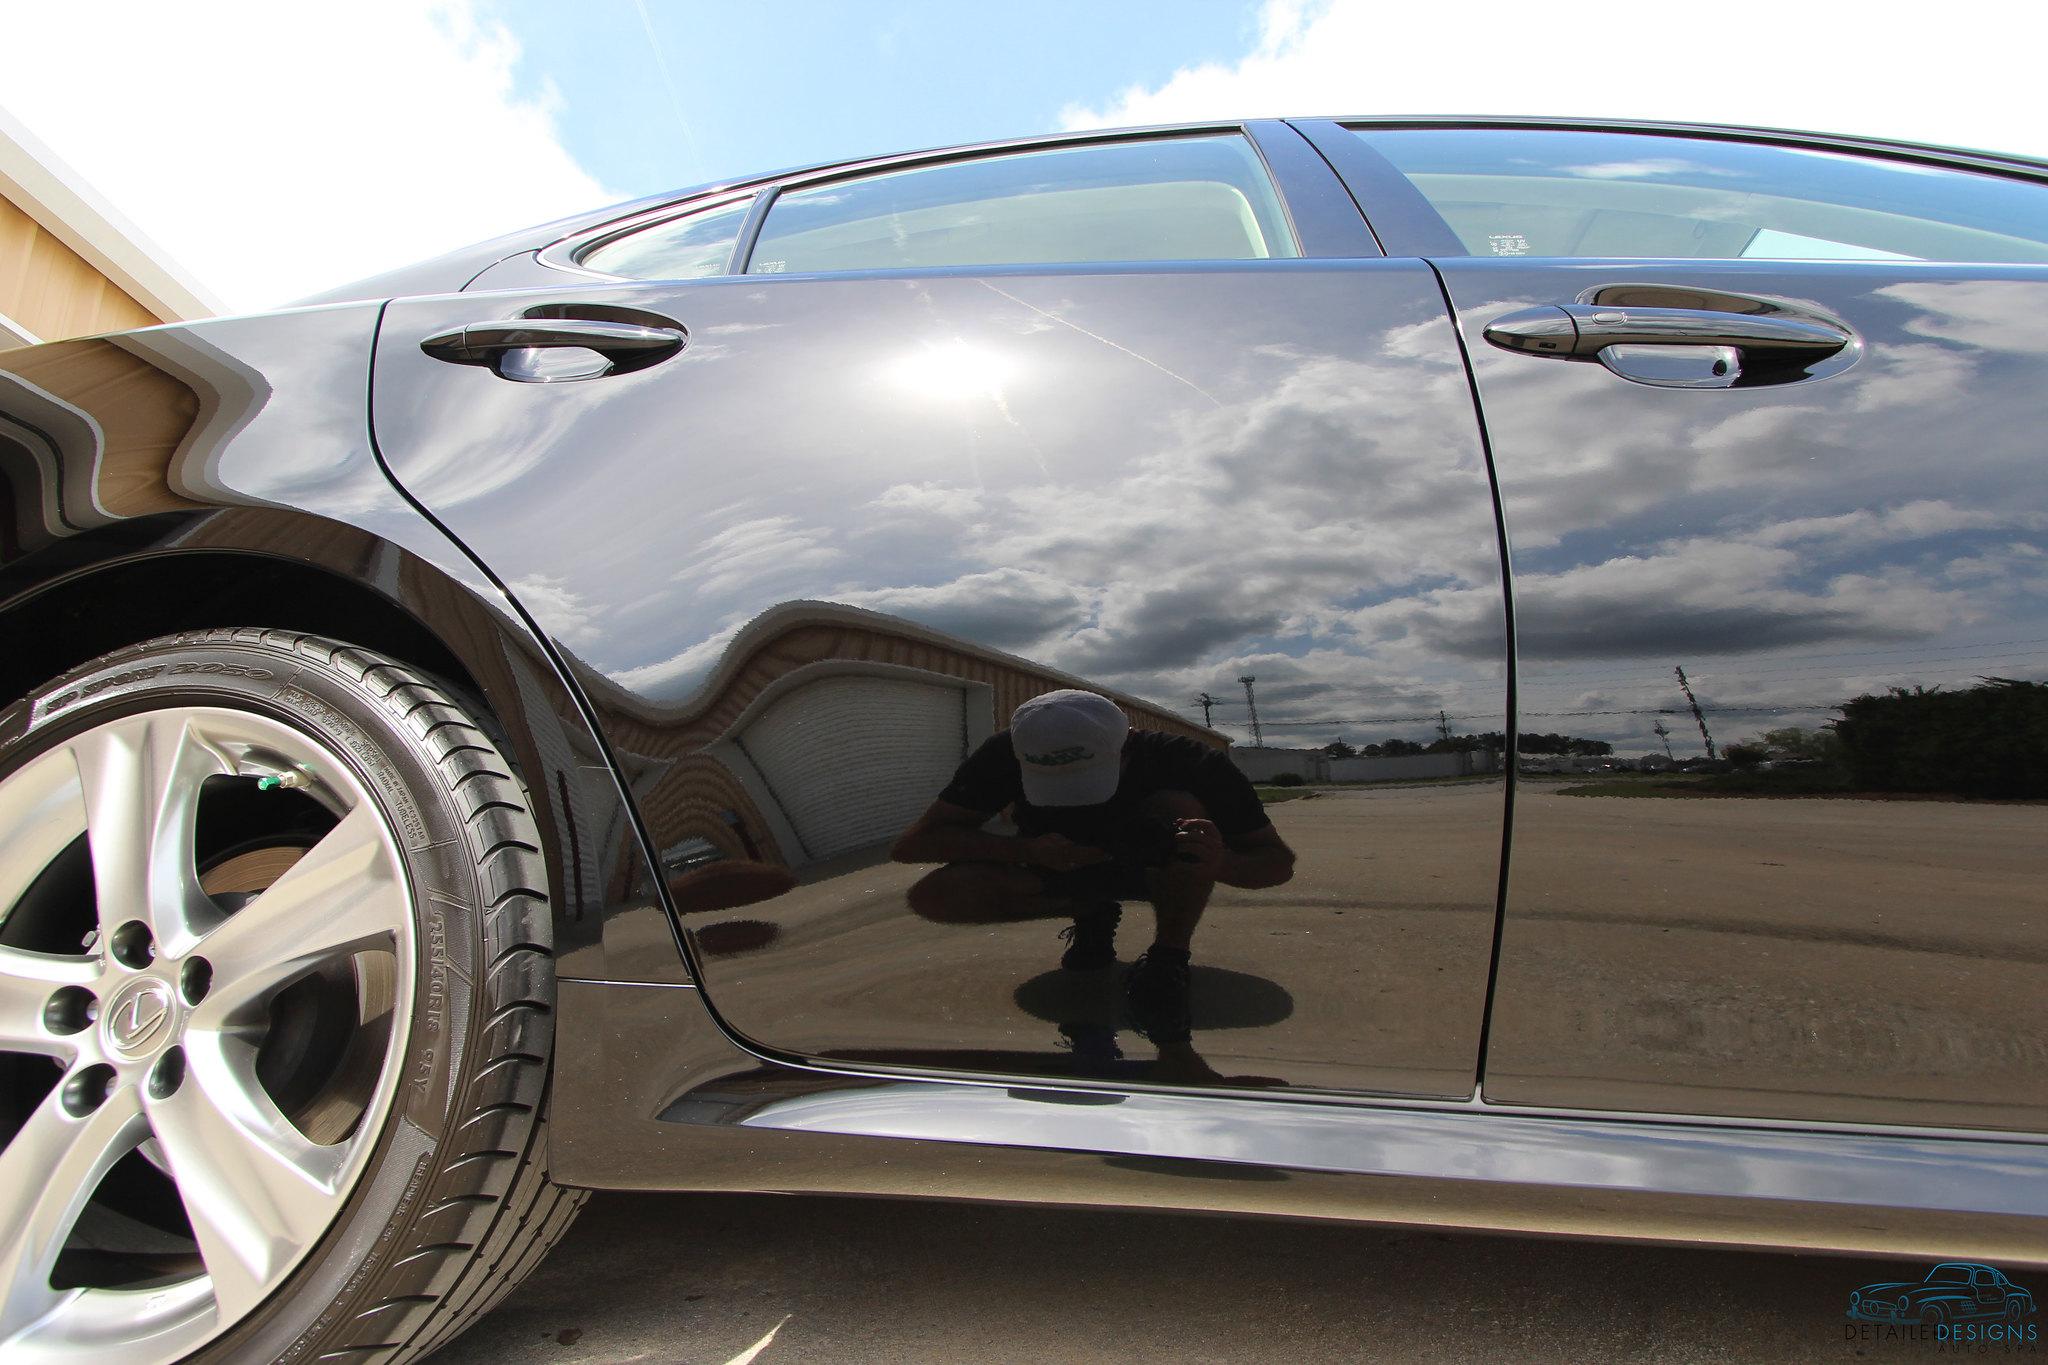 Car Painting Atlanta Of Atlanta Auto Detailing Company Saves Lexus Paint From Swirls